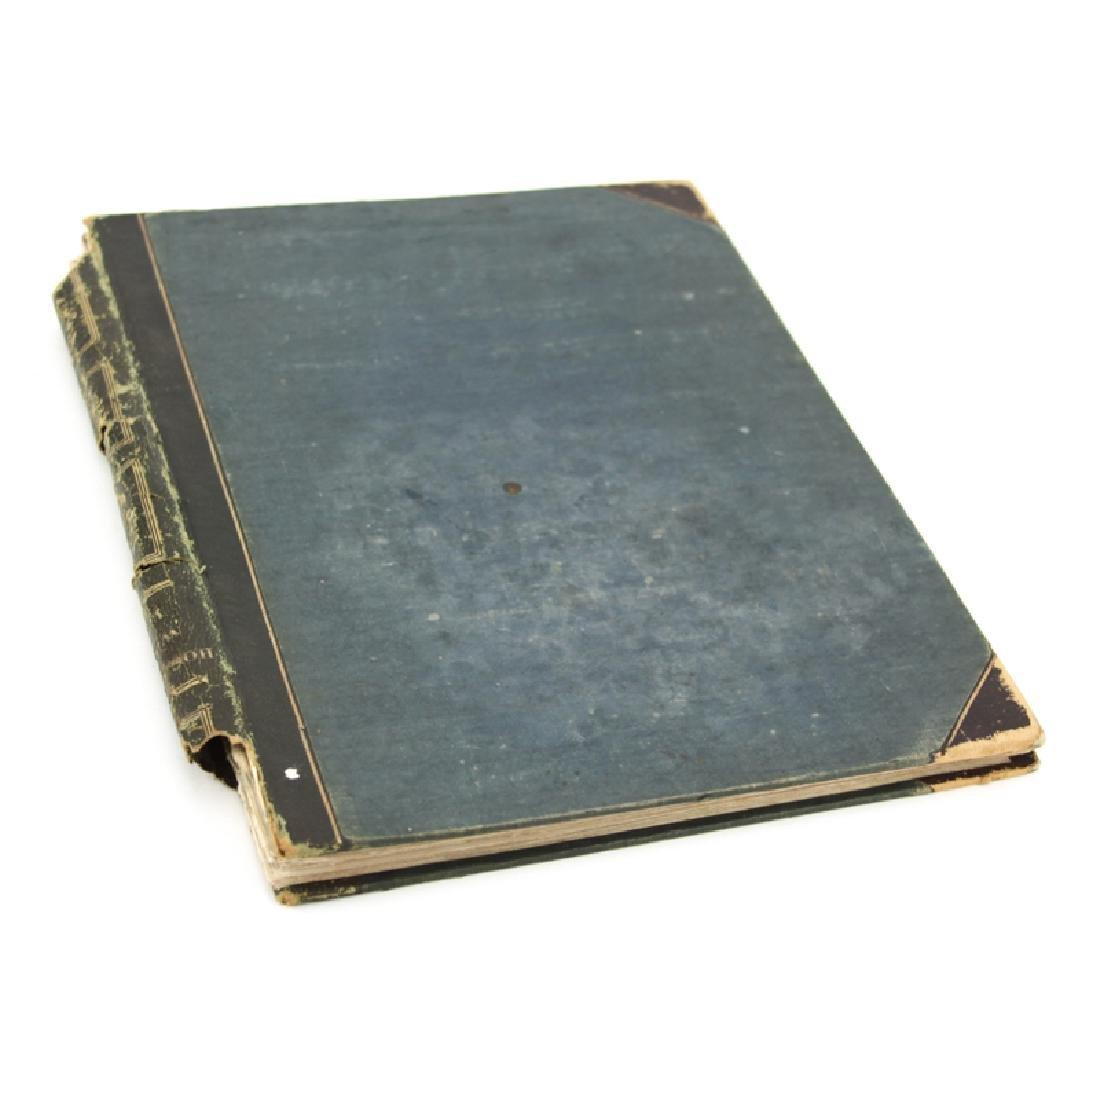 Book of Twenty-One Prints By William Hogarth. Includes,